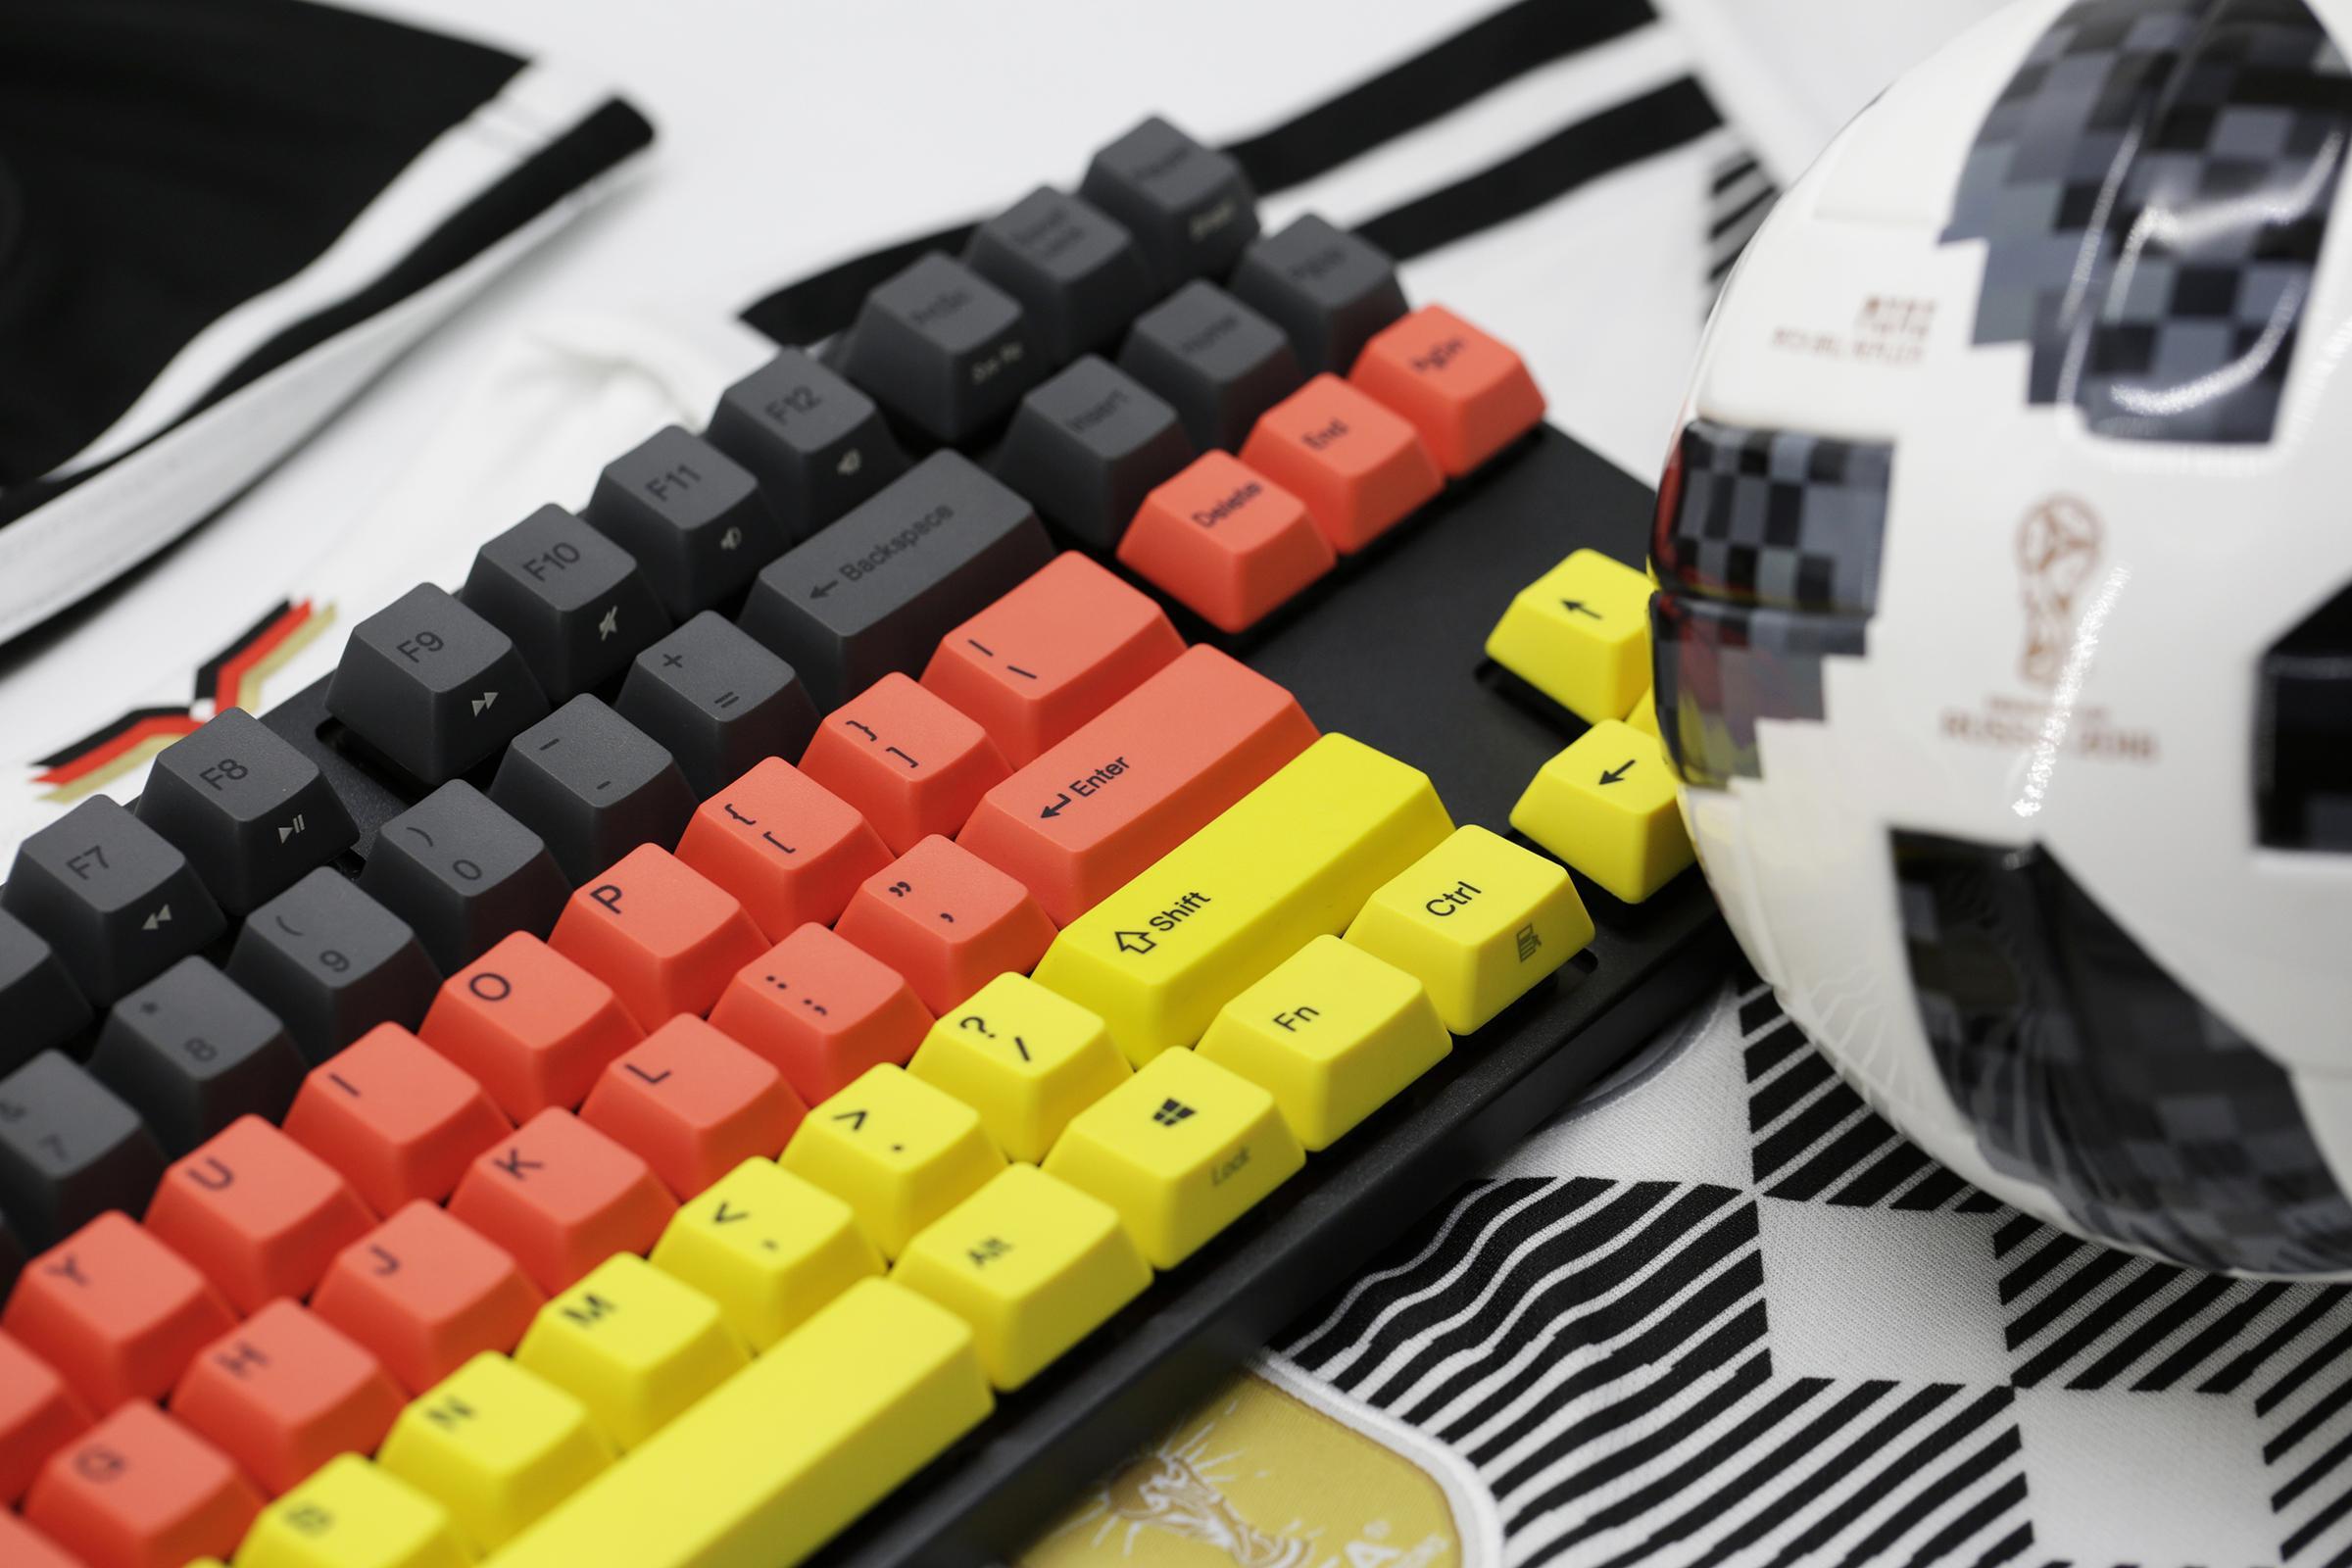 74799677d08 Varmilo VA87M Football / Soccer Germany Mechanical Keyboard. Available  Switches